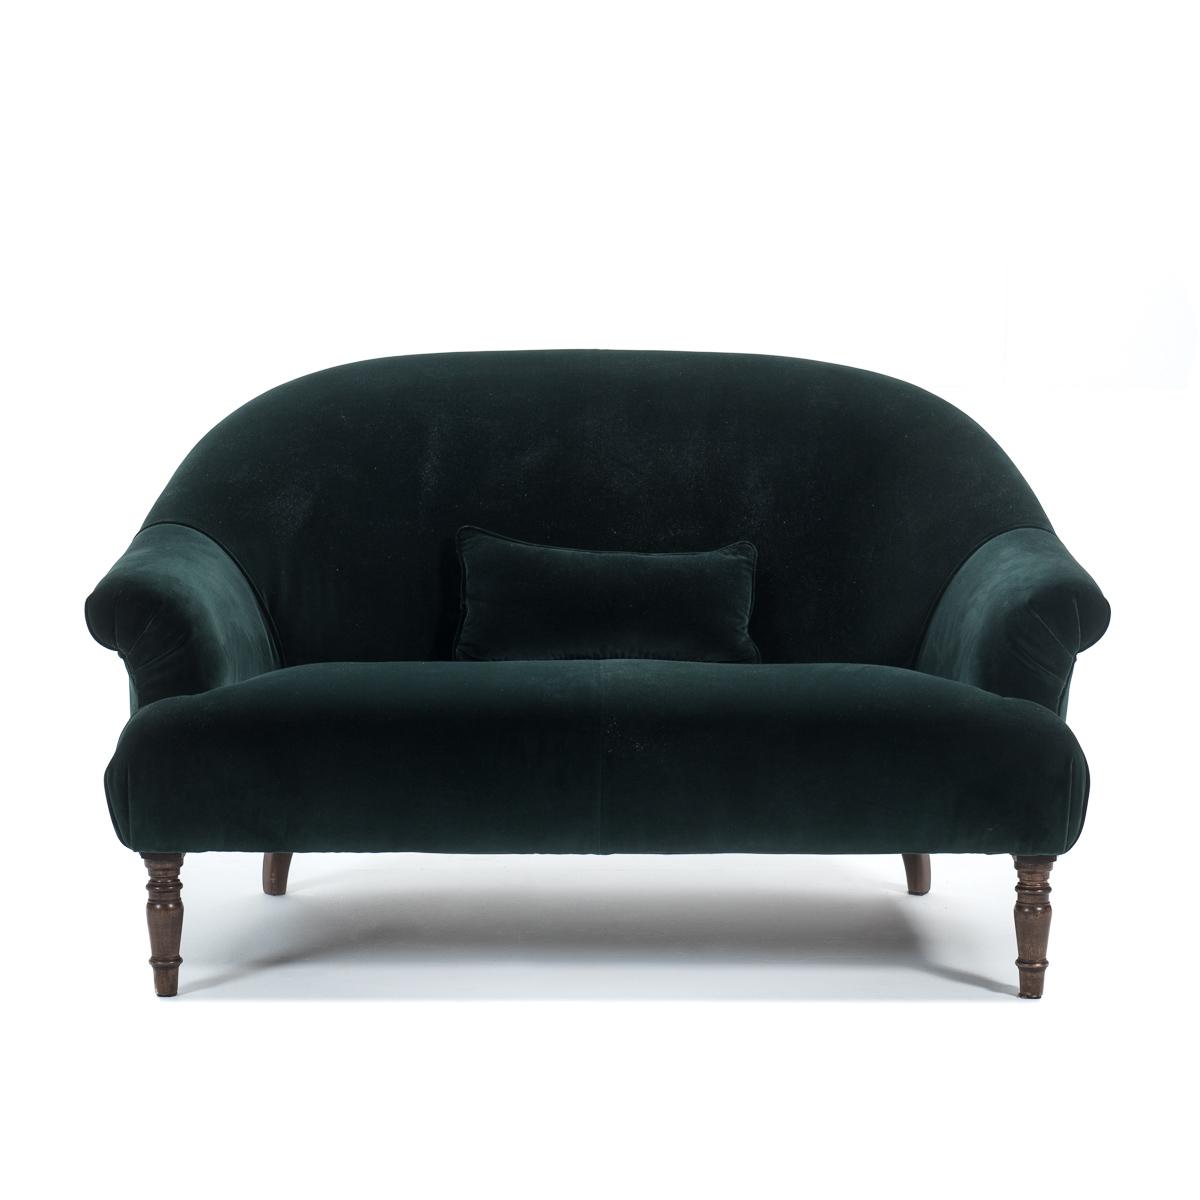 Imogen 2 Seater Sofa